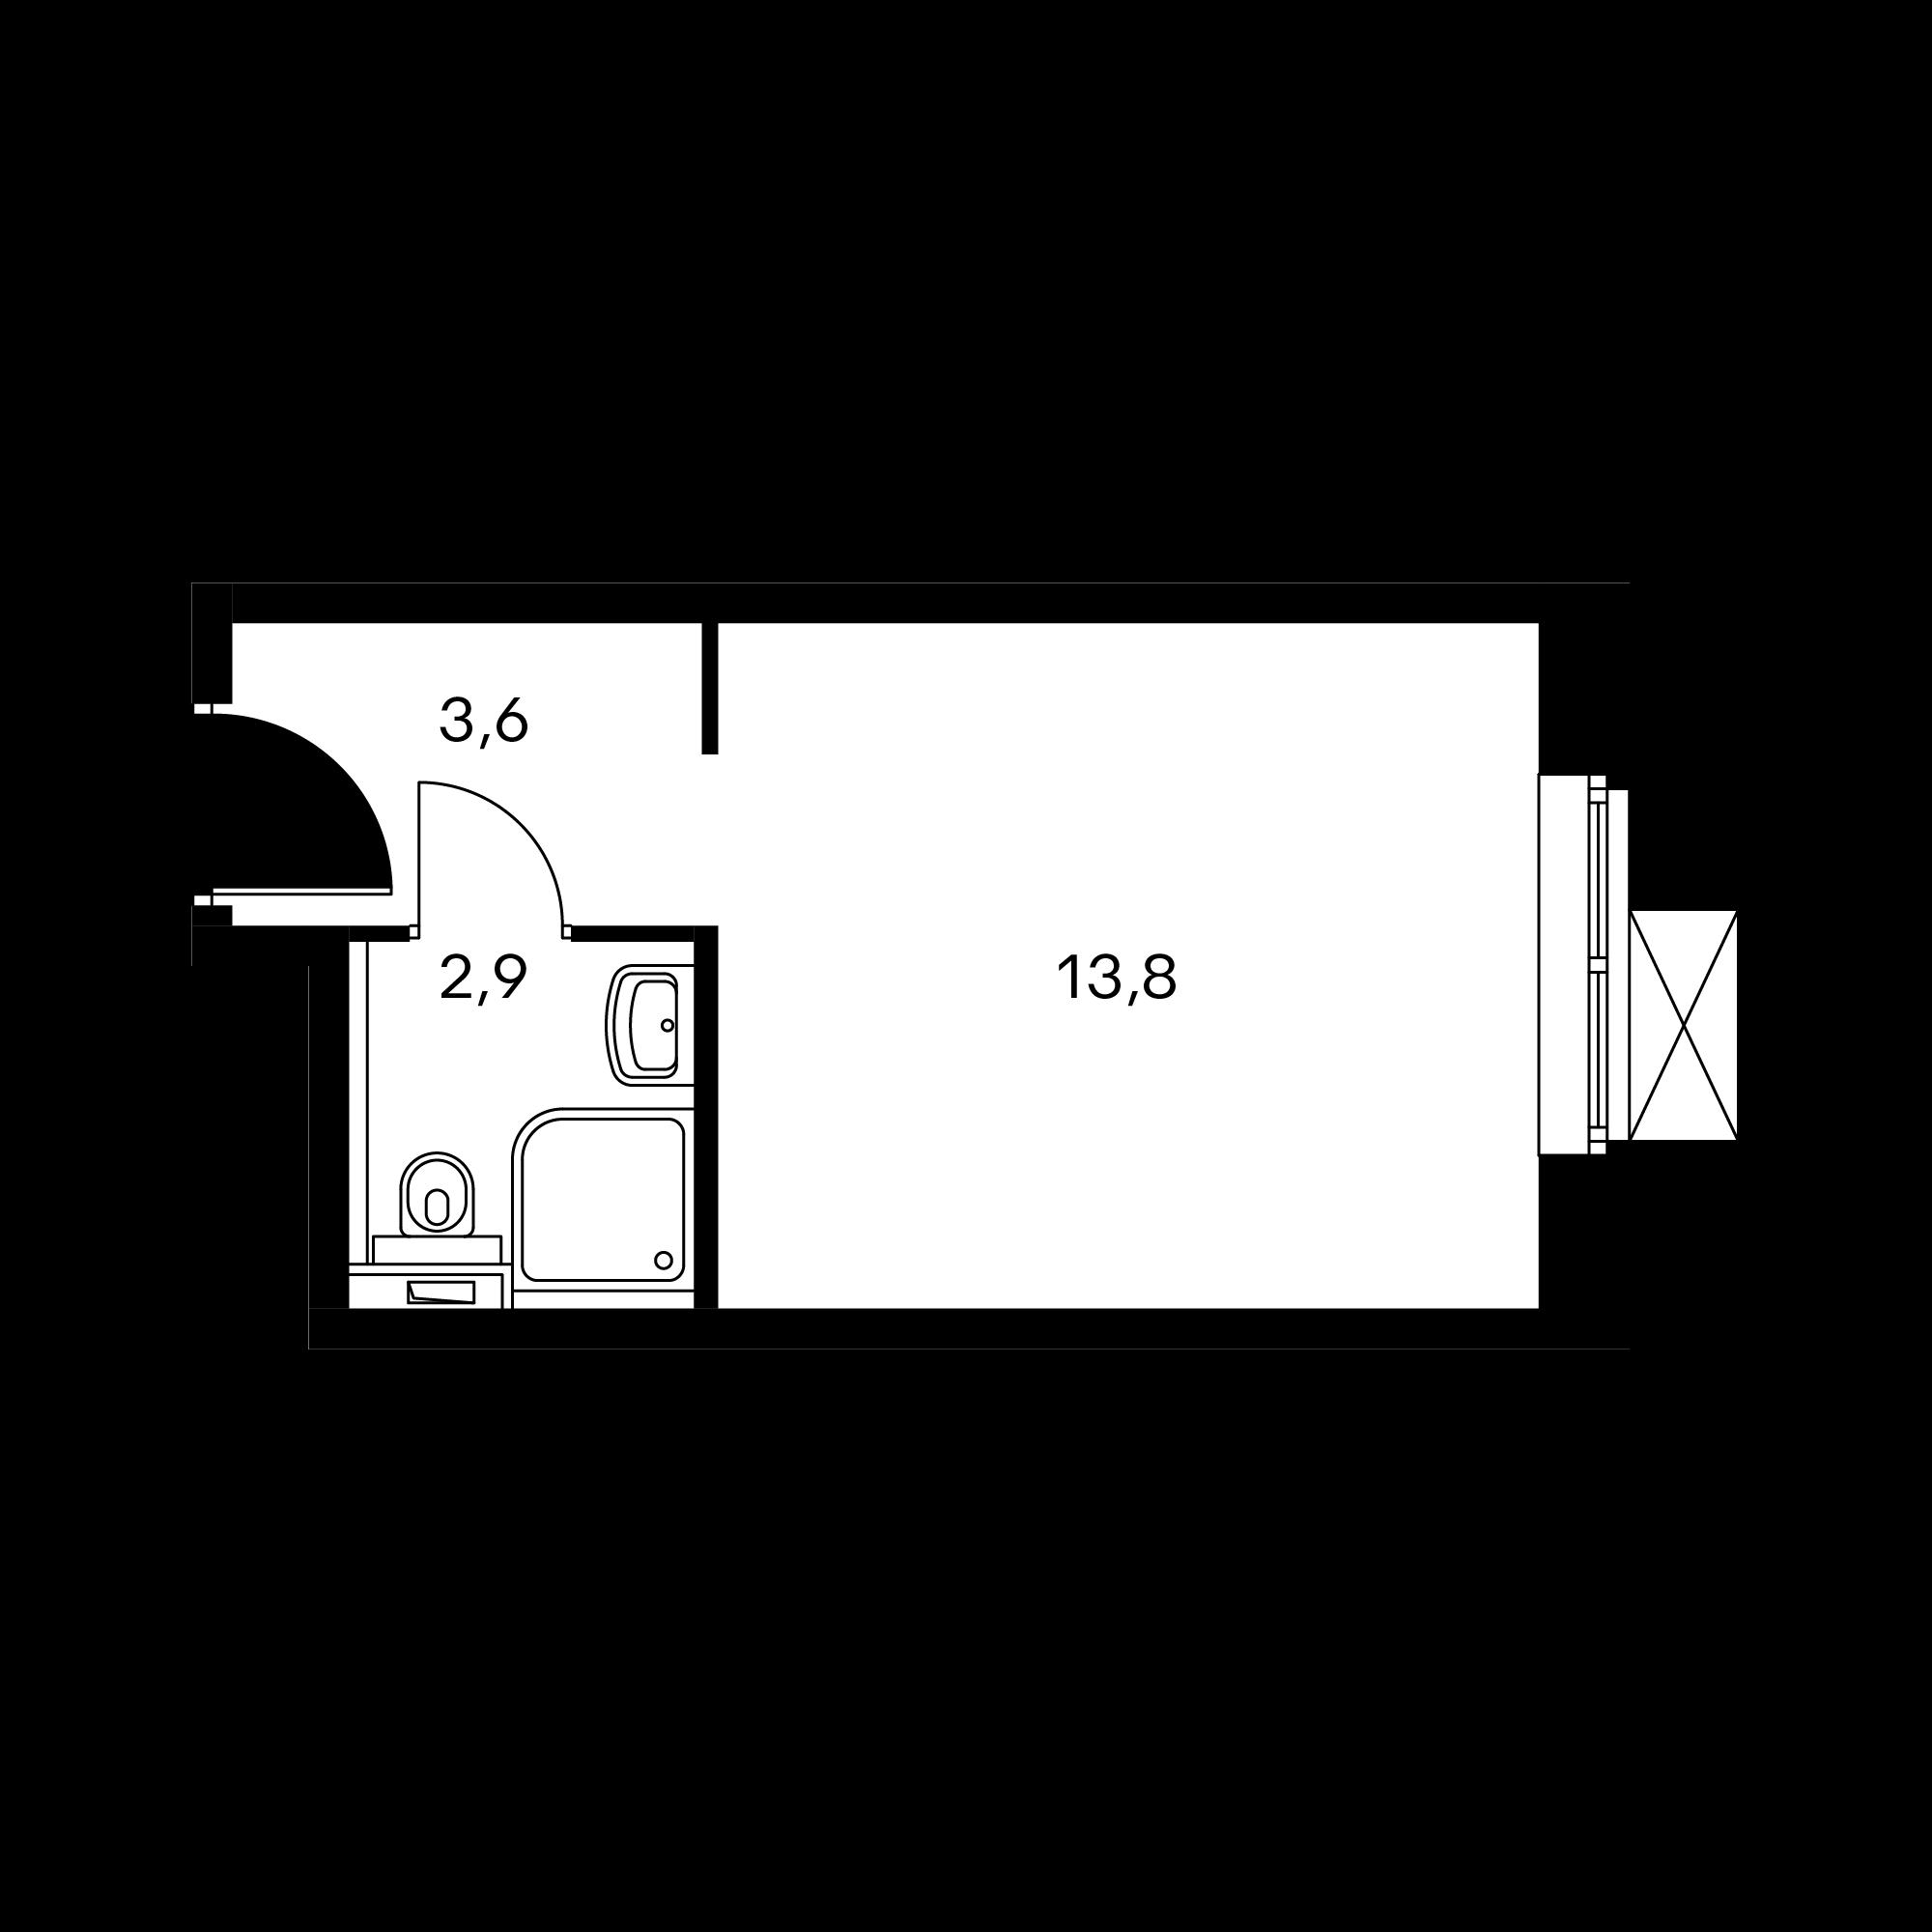 1NS1_3.6-1_Z*